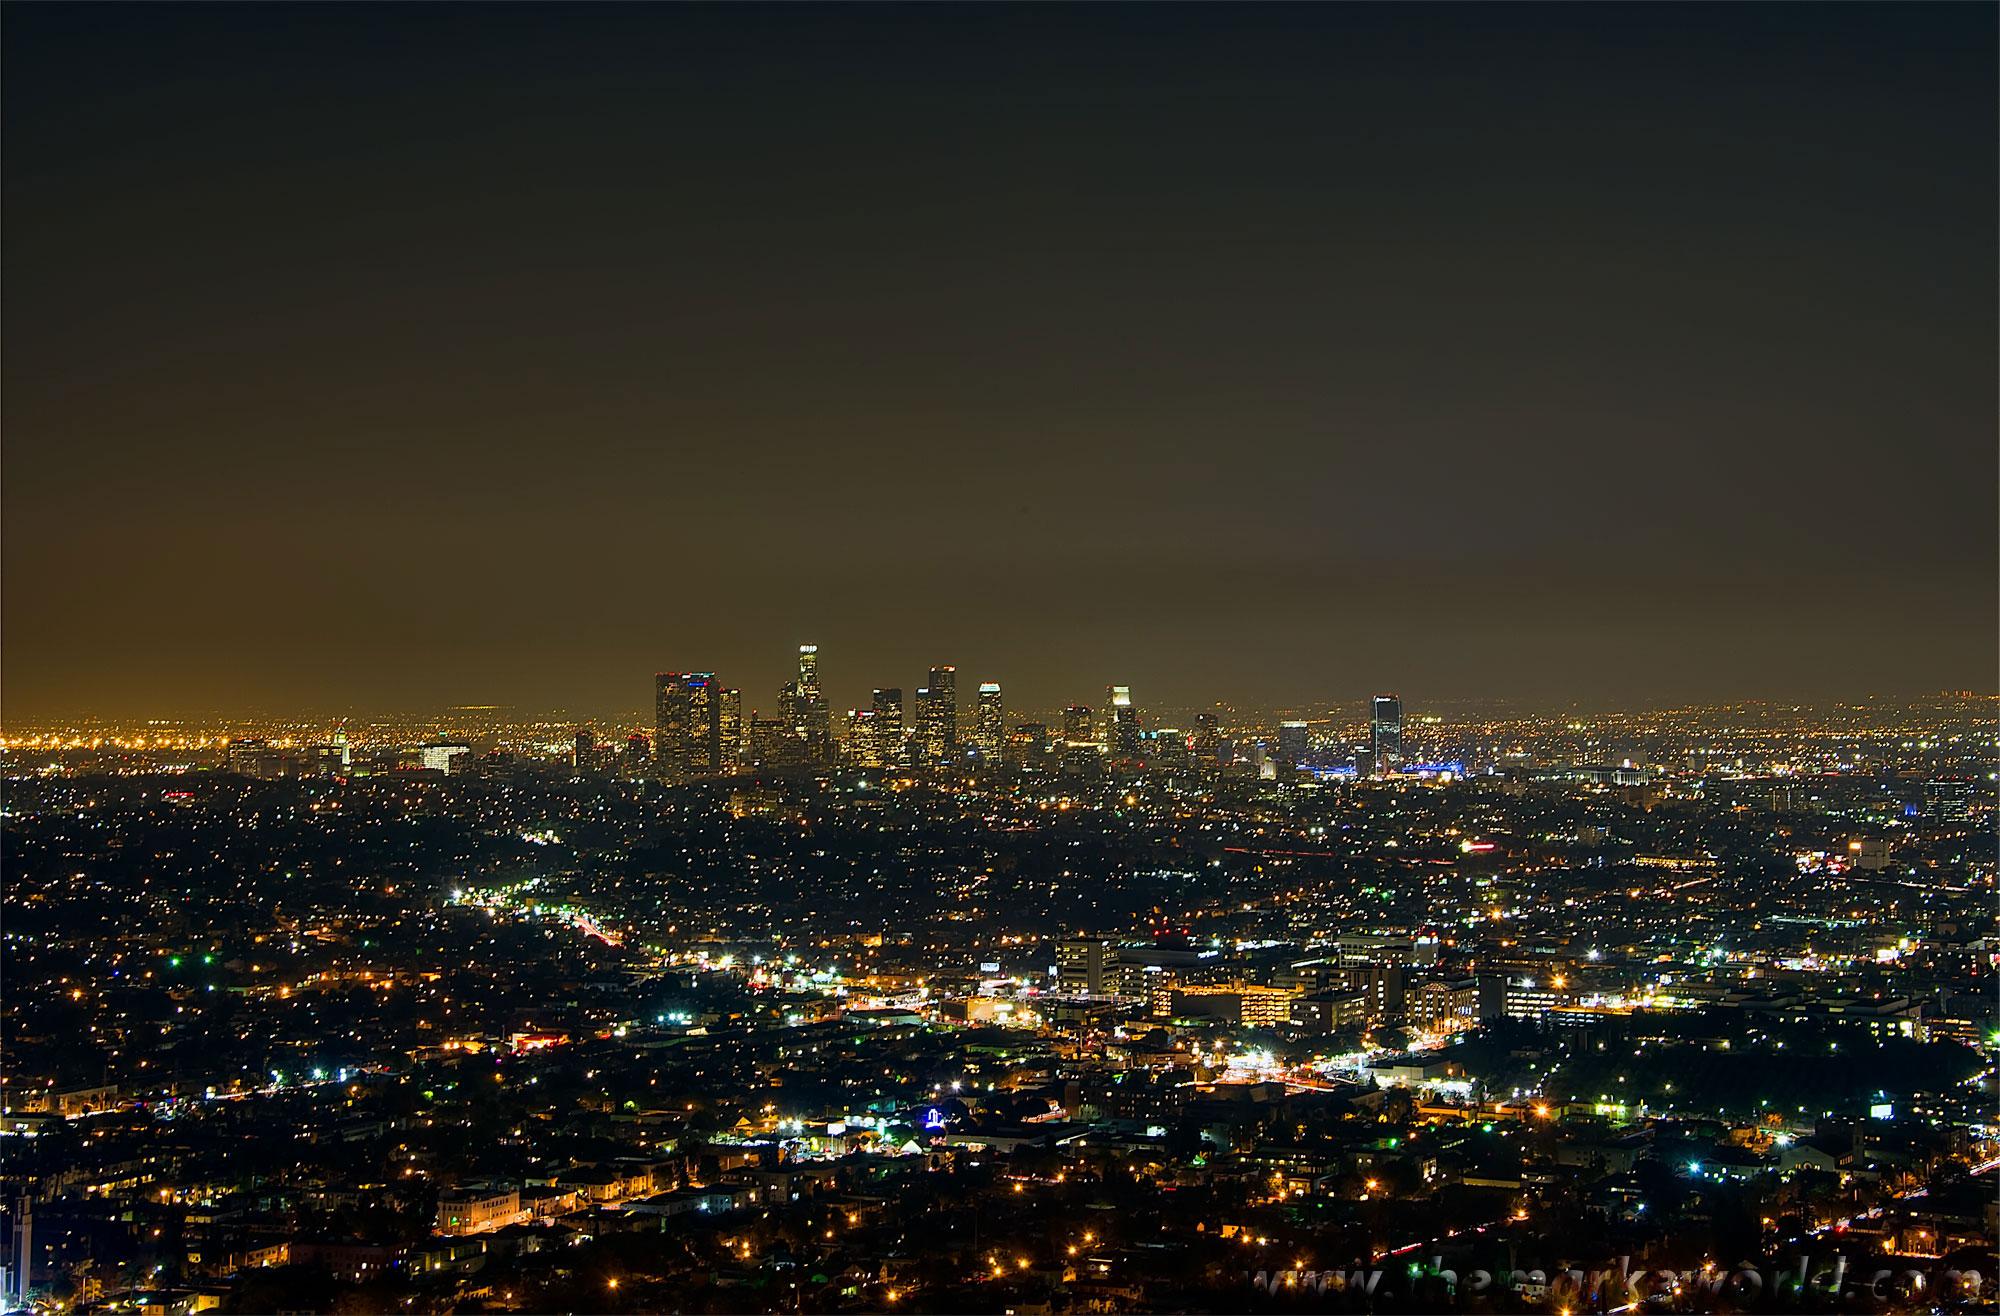 City lights background wallpapersafari - Night light city wallpaper ...